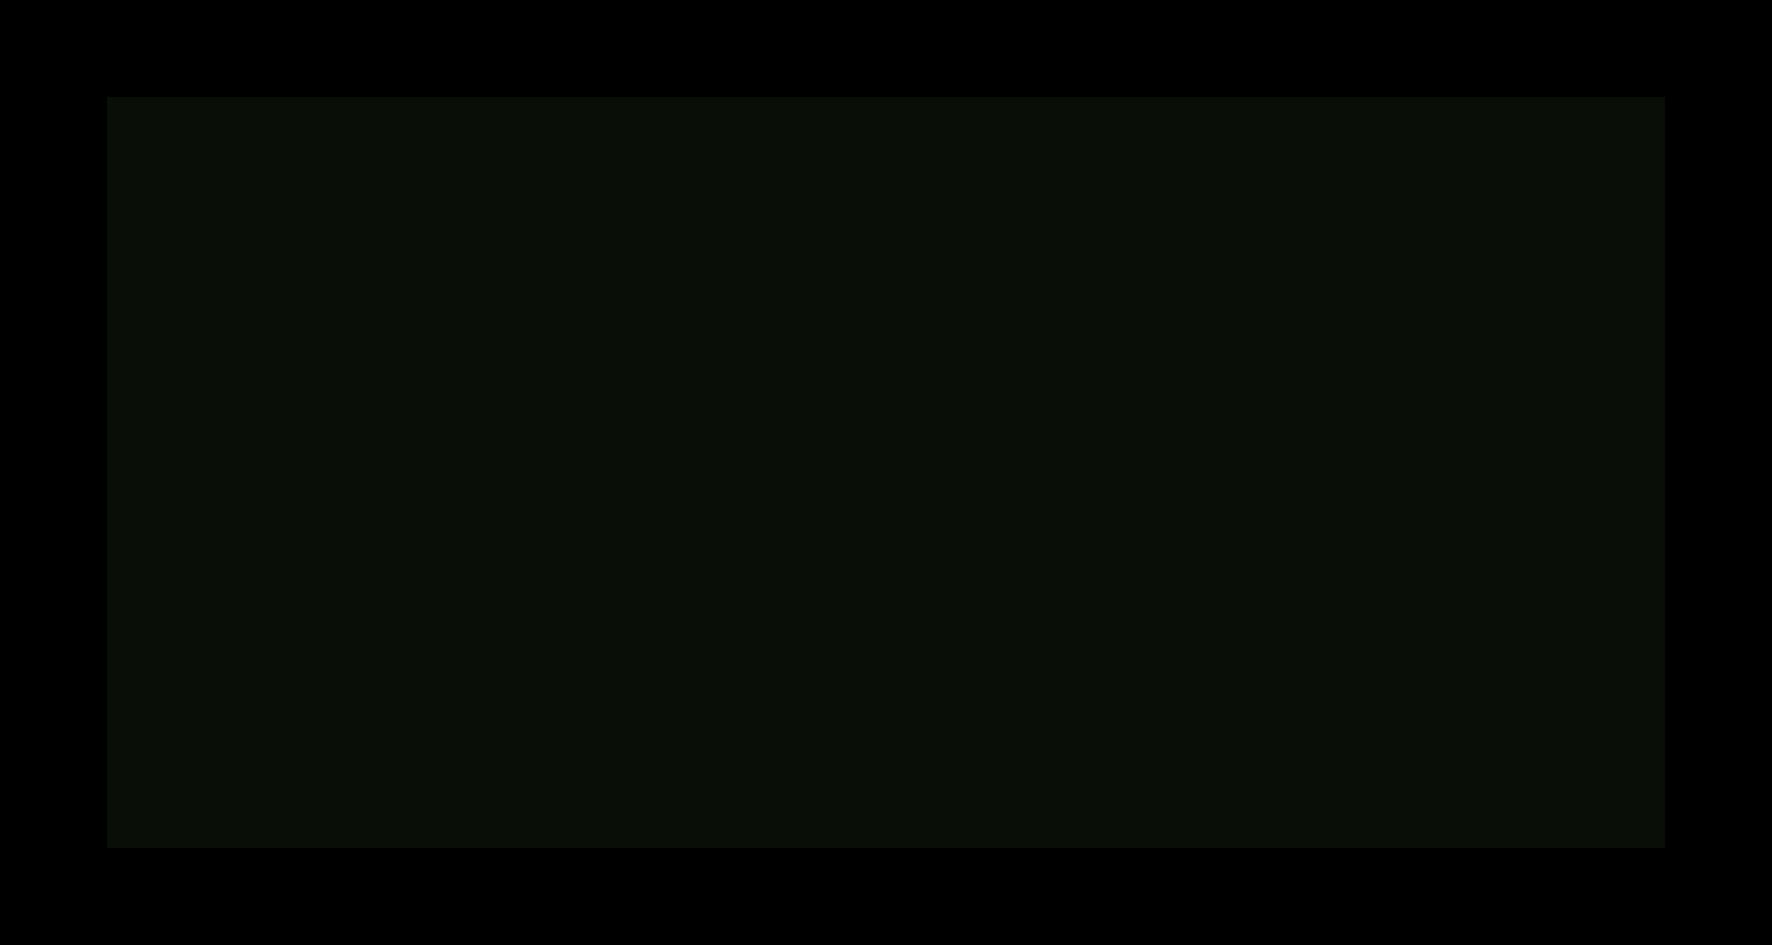 http://highend-traveller.com/citilink-is-the-official-airline-partner-of-bali-film-festival/